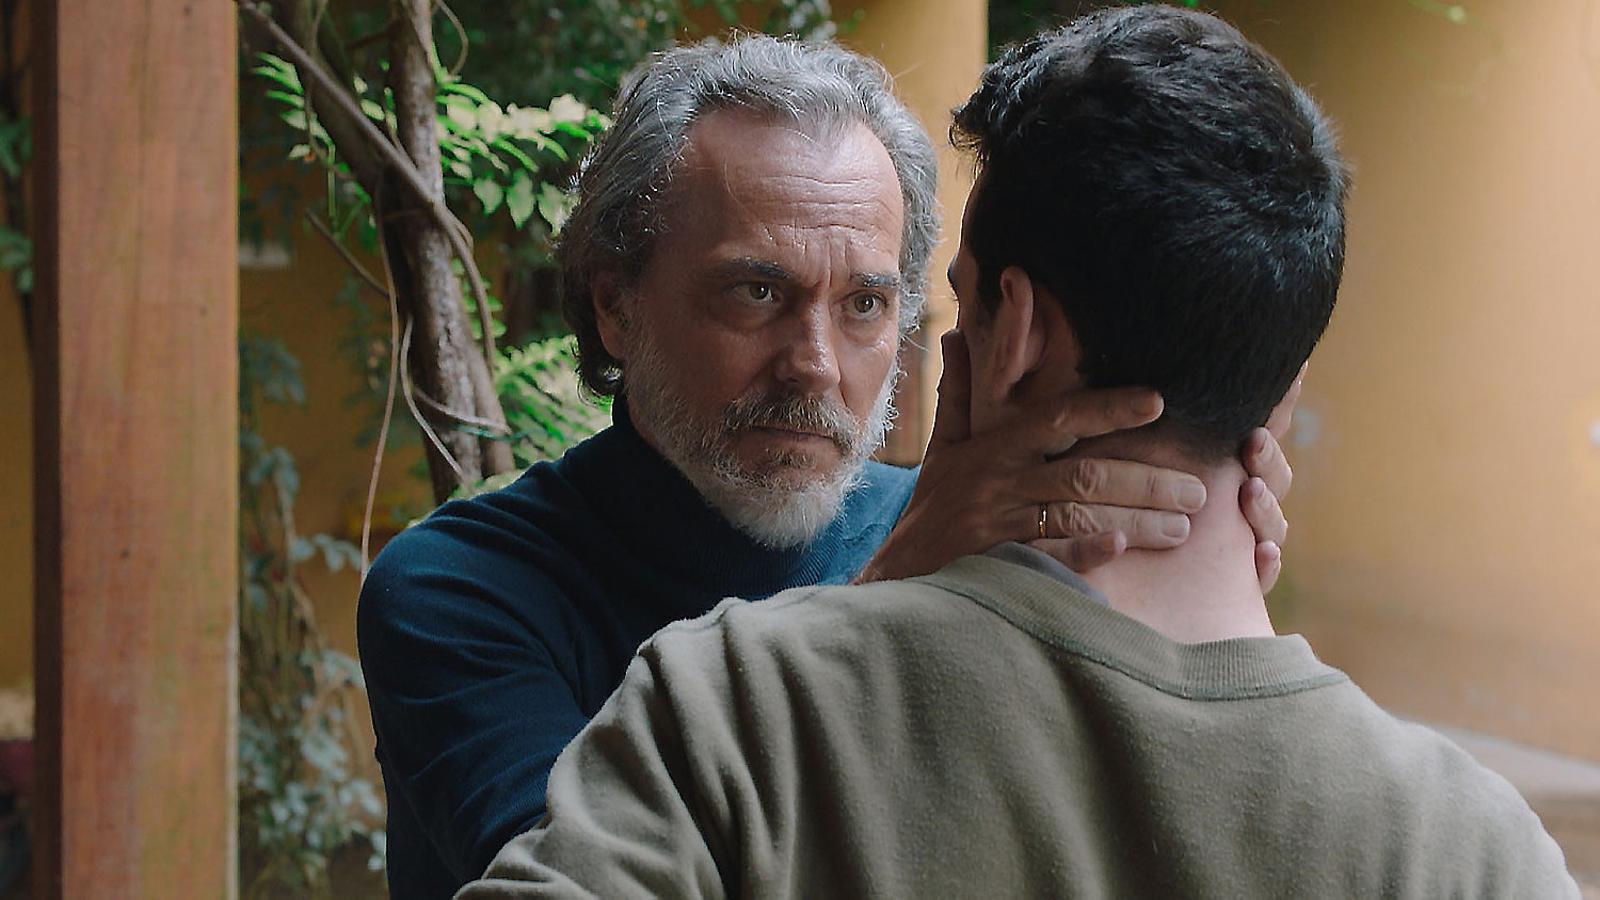 Telecinco refà la seva graella per estrenar 'Vivir sin permiso'